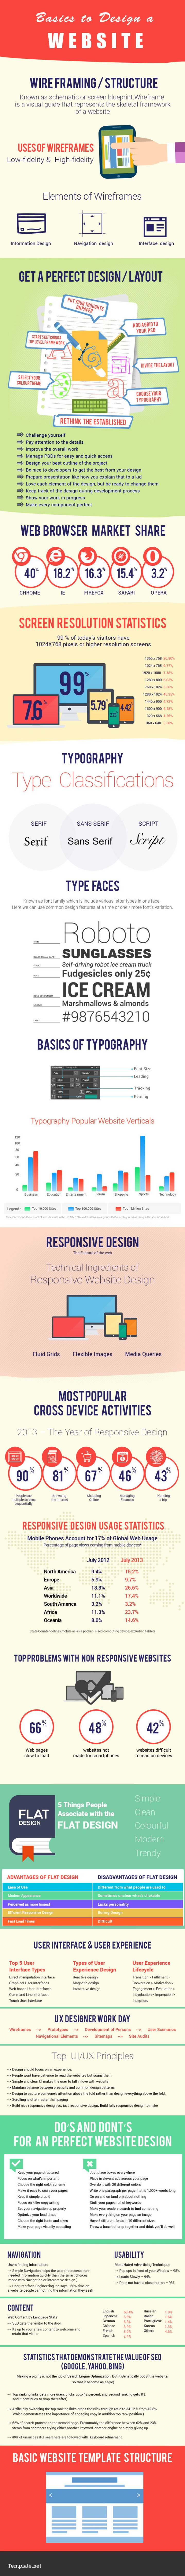 The Essentials of Successful Website Design [Infographic]